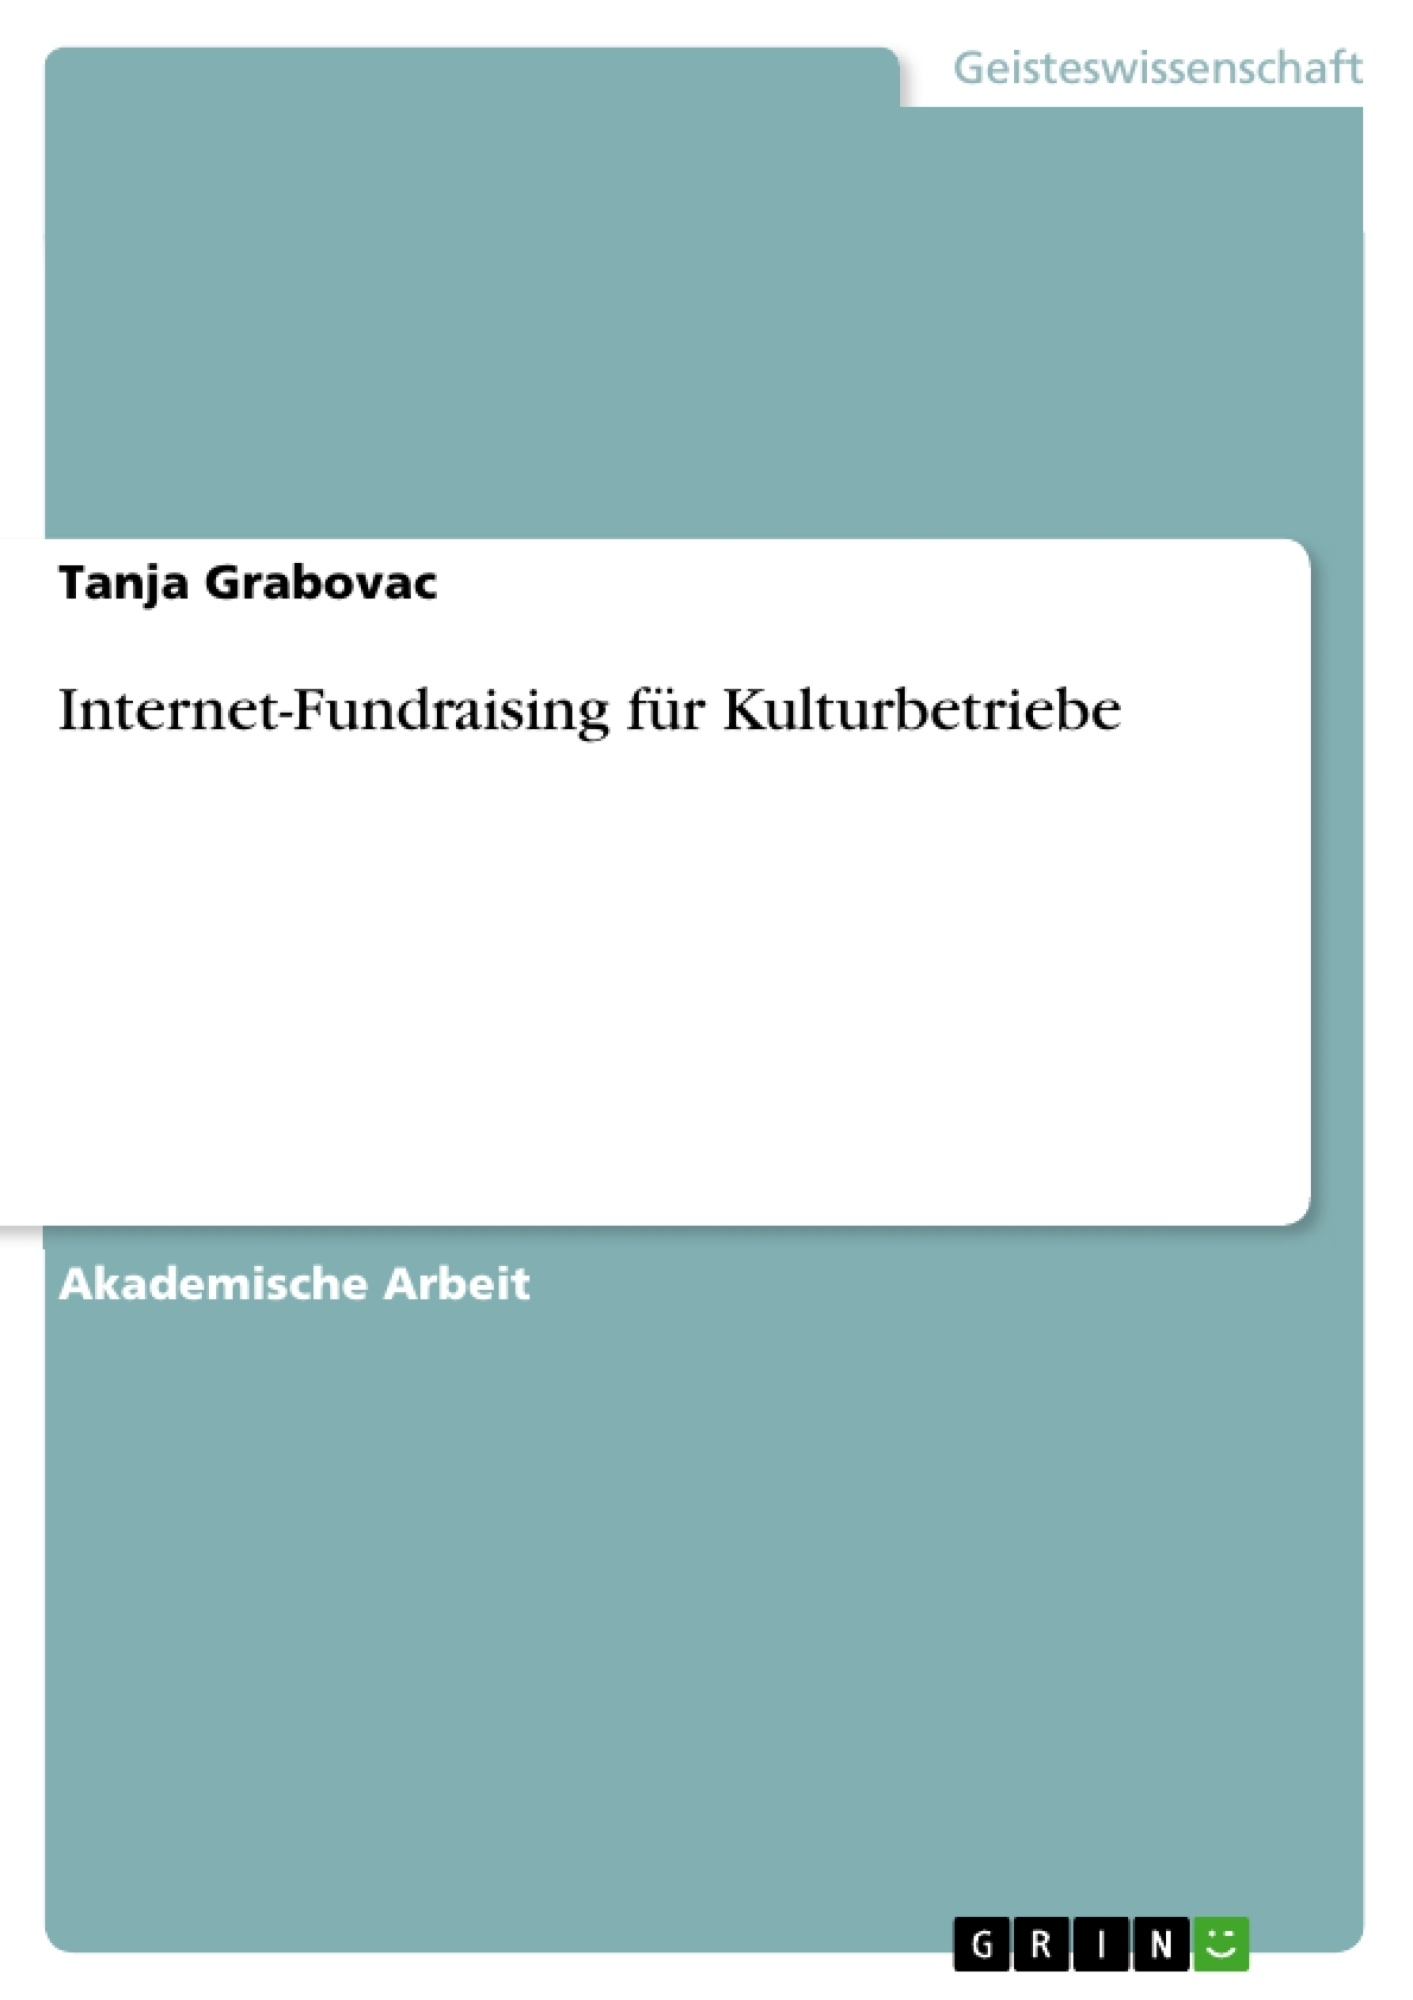 Titel: Internet-Fundraising für Kulturbetriebe